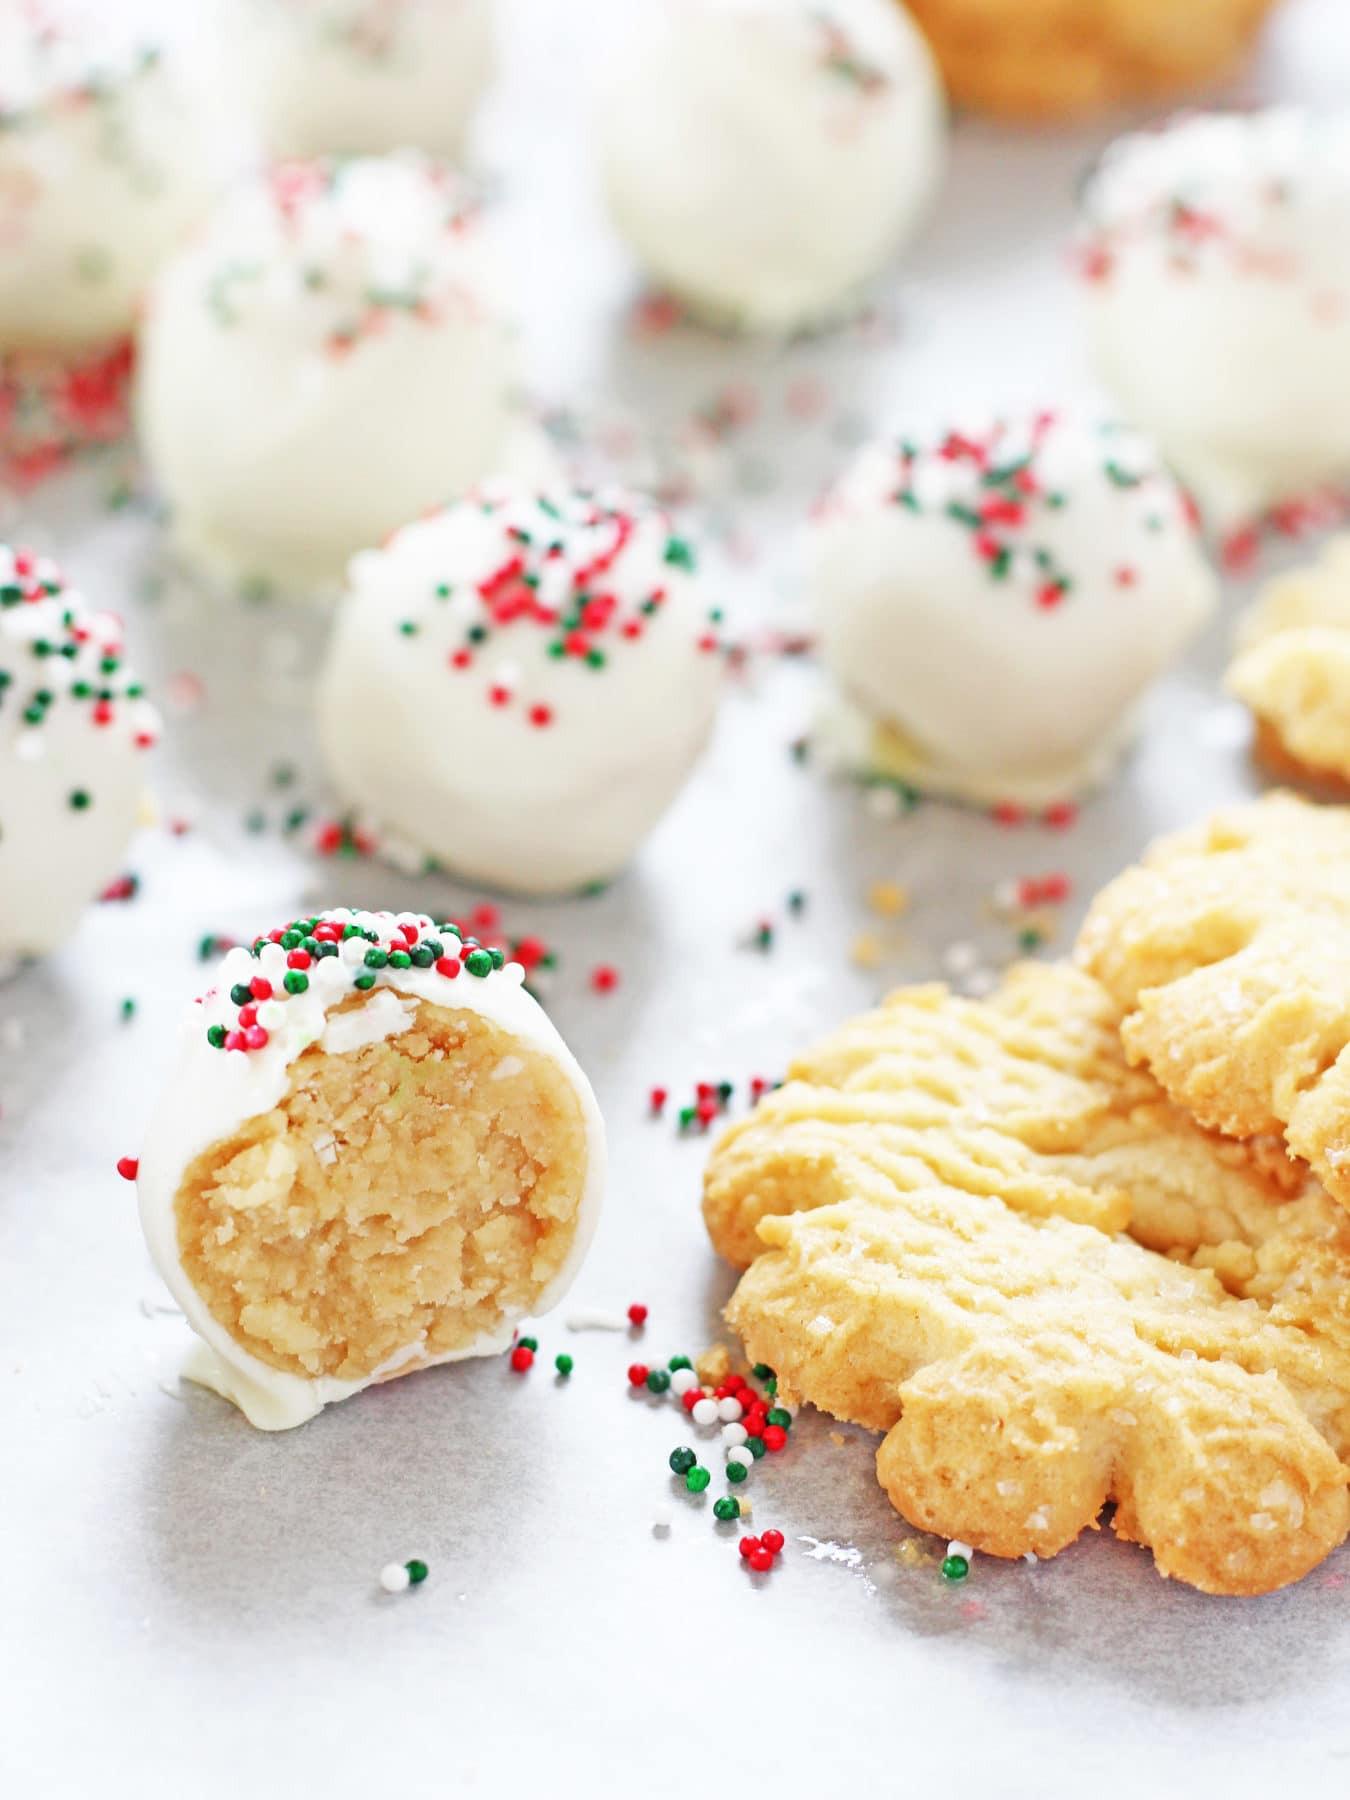 Easy Christmas Cookies Recipes  Christmas Cookies Easy Christmas Recipes The 36th AVENUE